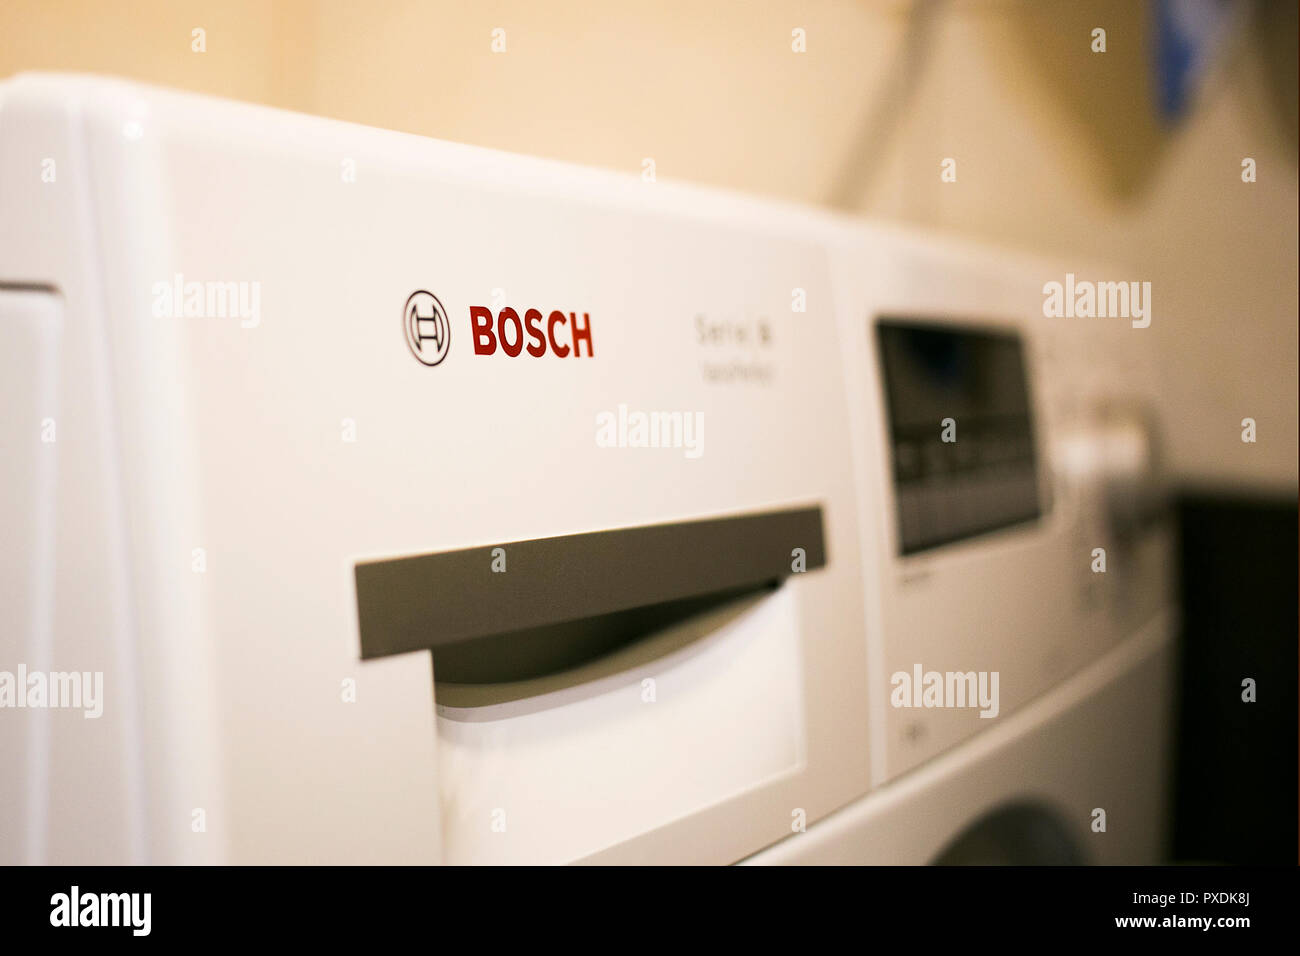 Washing Machine Logo Stock Photos & Washing Machine Logo Stock